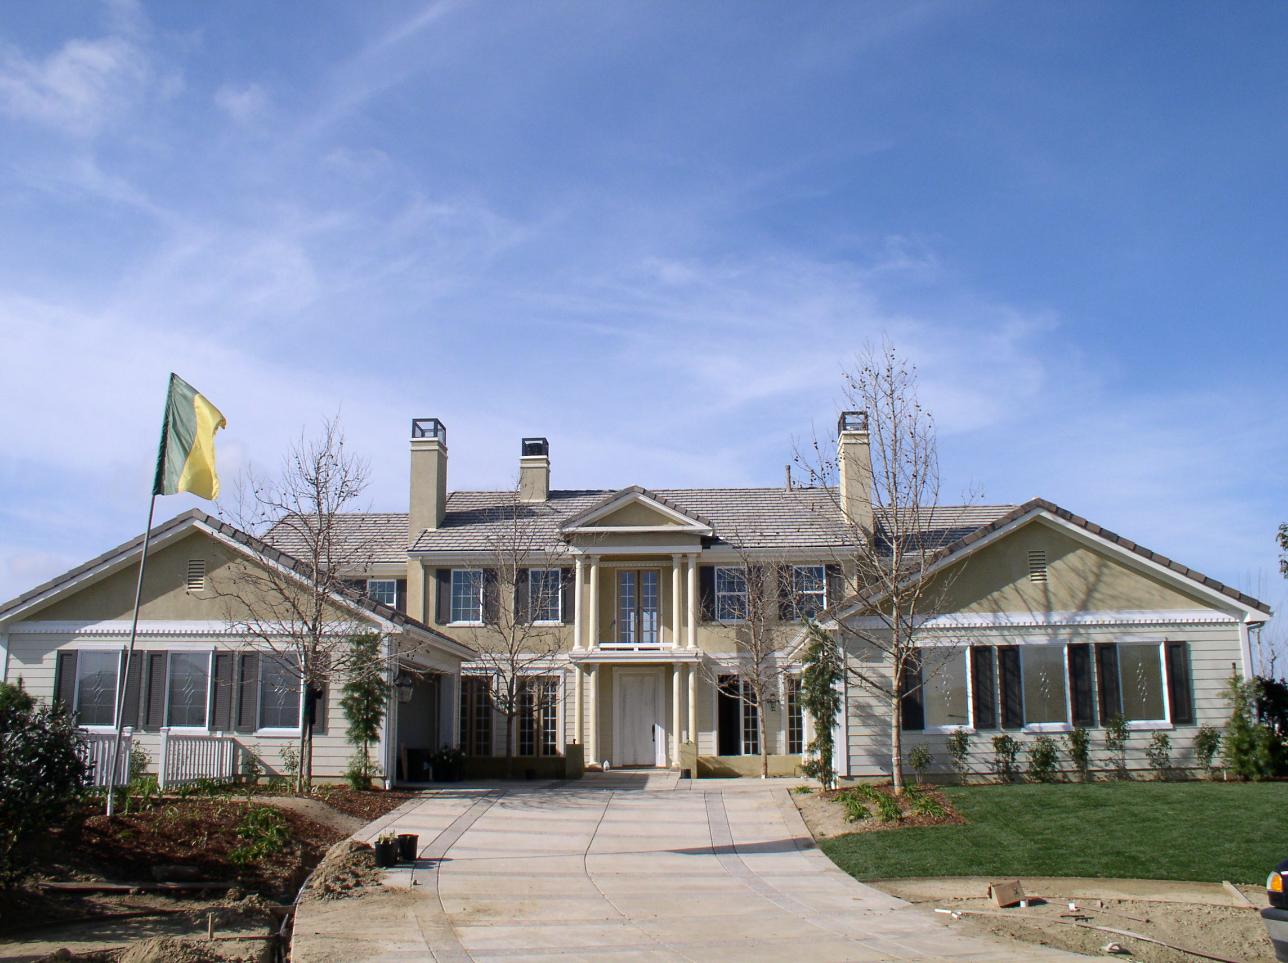 Magnolia Estates in Carlsbad